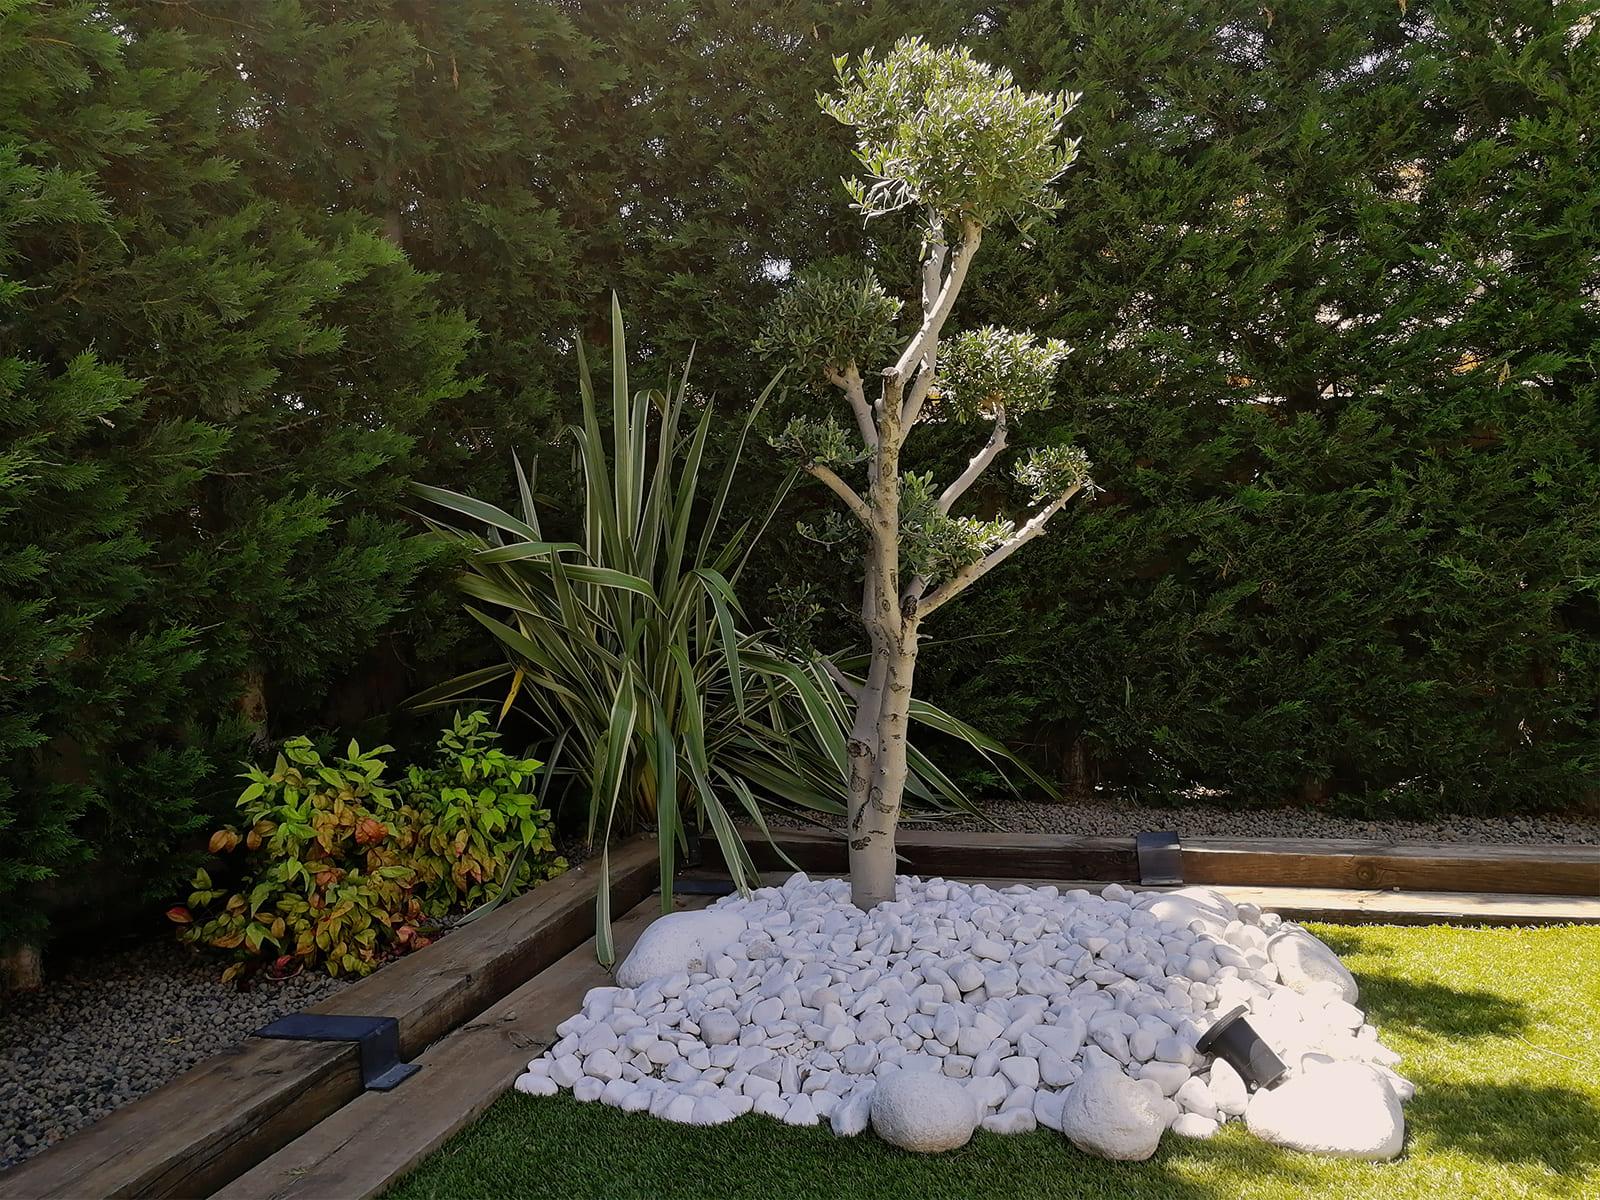 diseño-jardines-piscina-solarium-madera-IJ-17_HIDROJARDIN-Bañeres.jpg